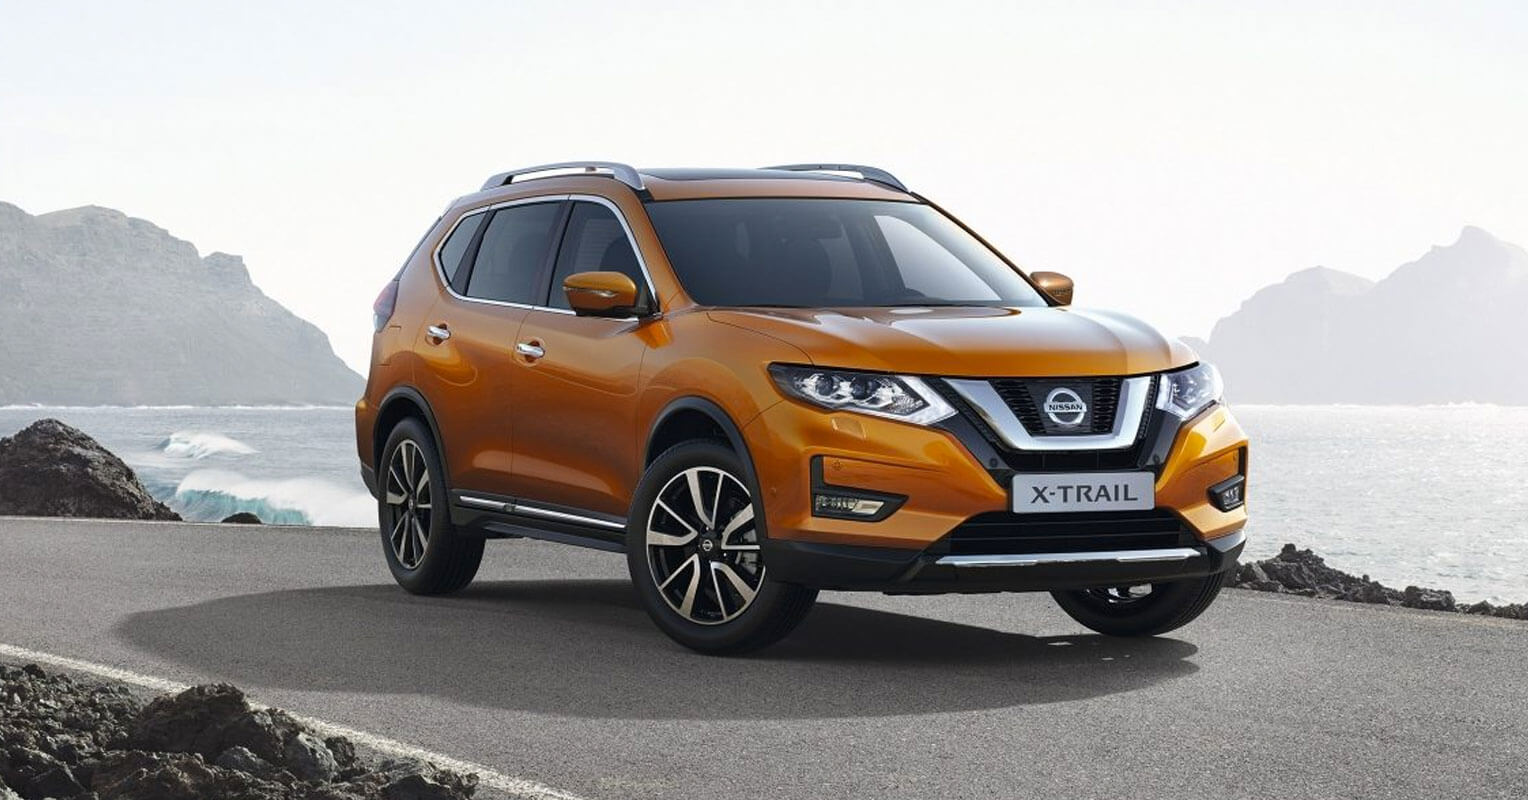 X-Trail, todoterreno 4x4 de Nissan